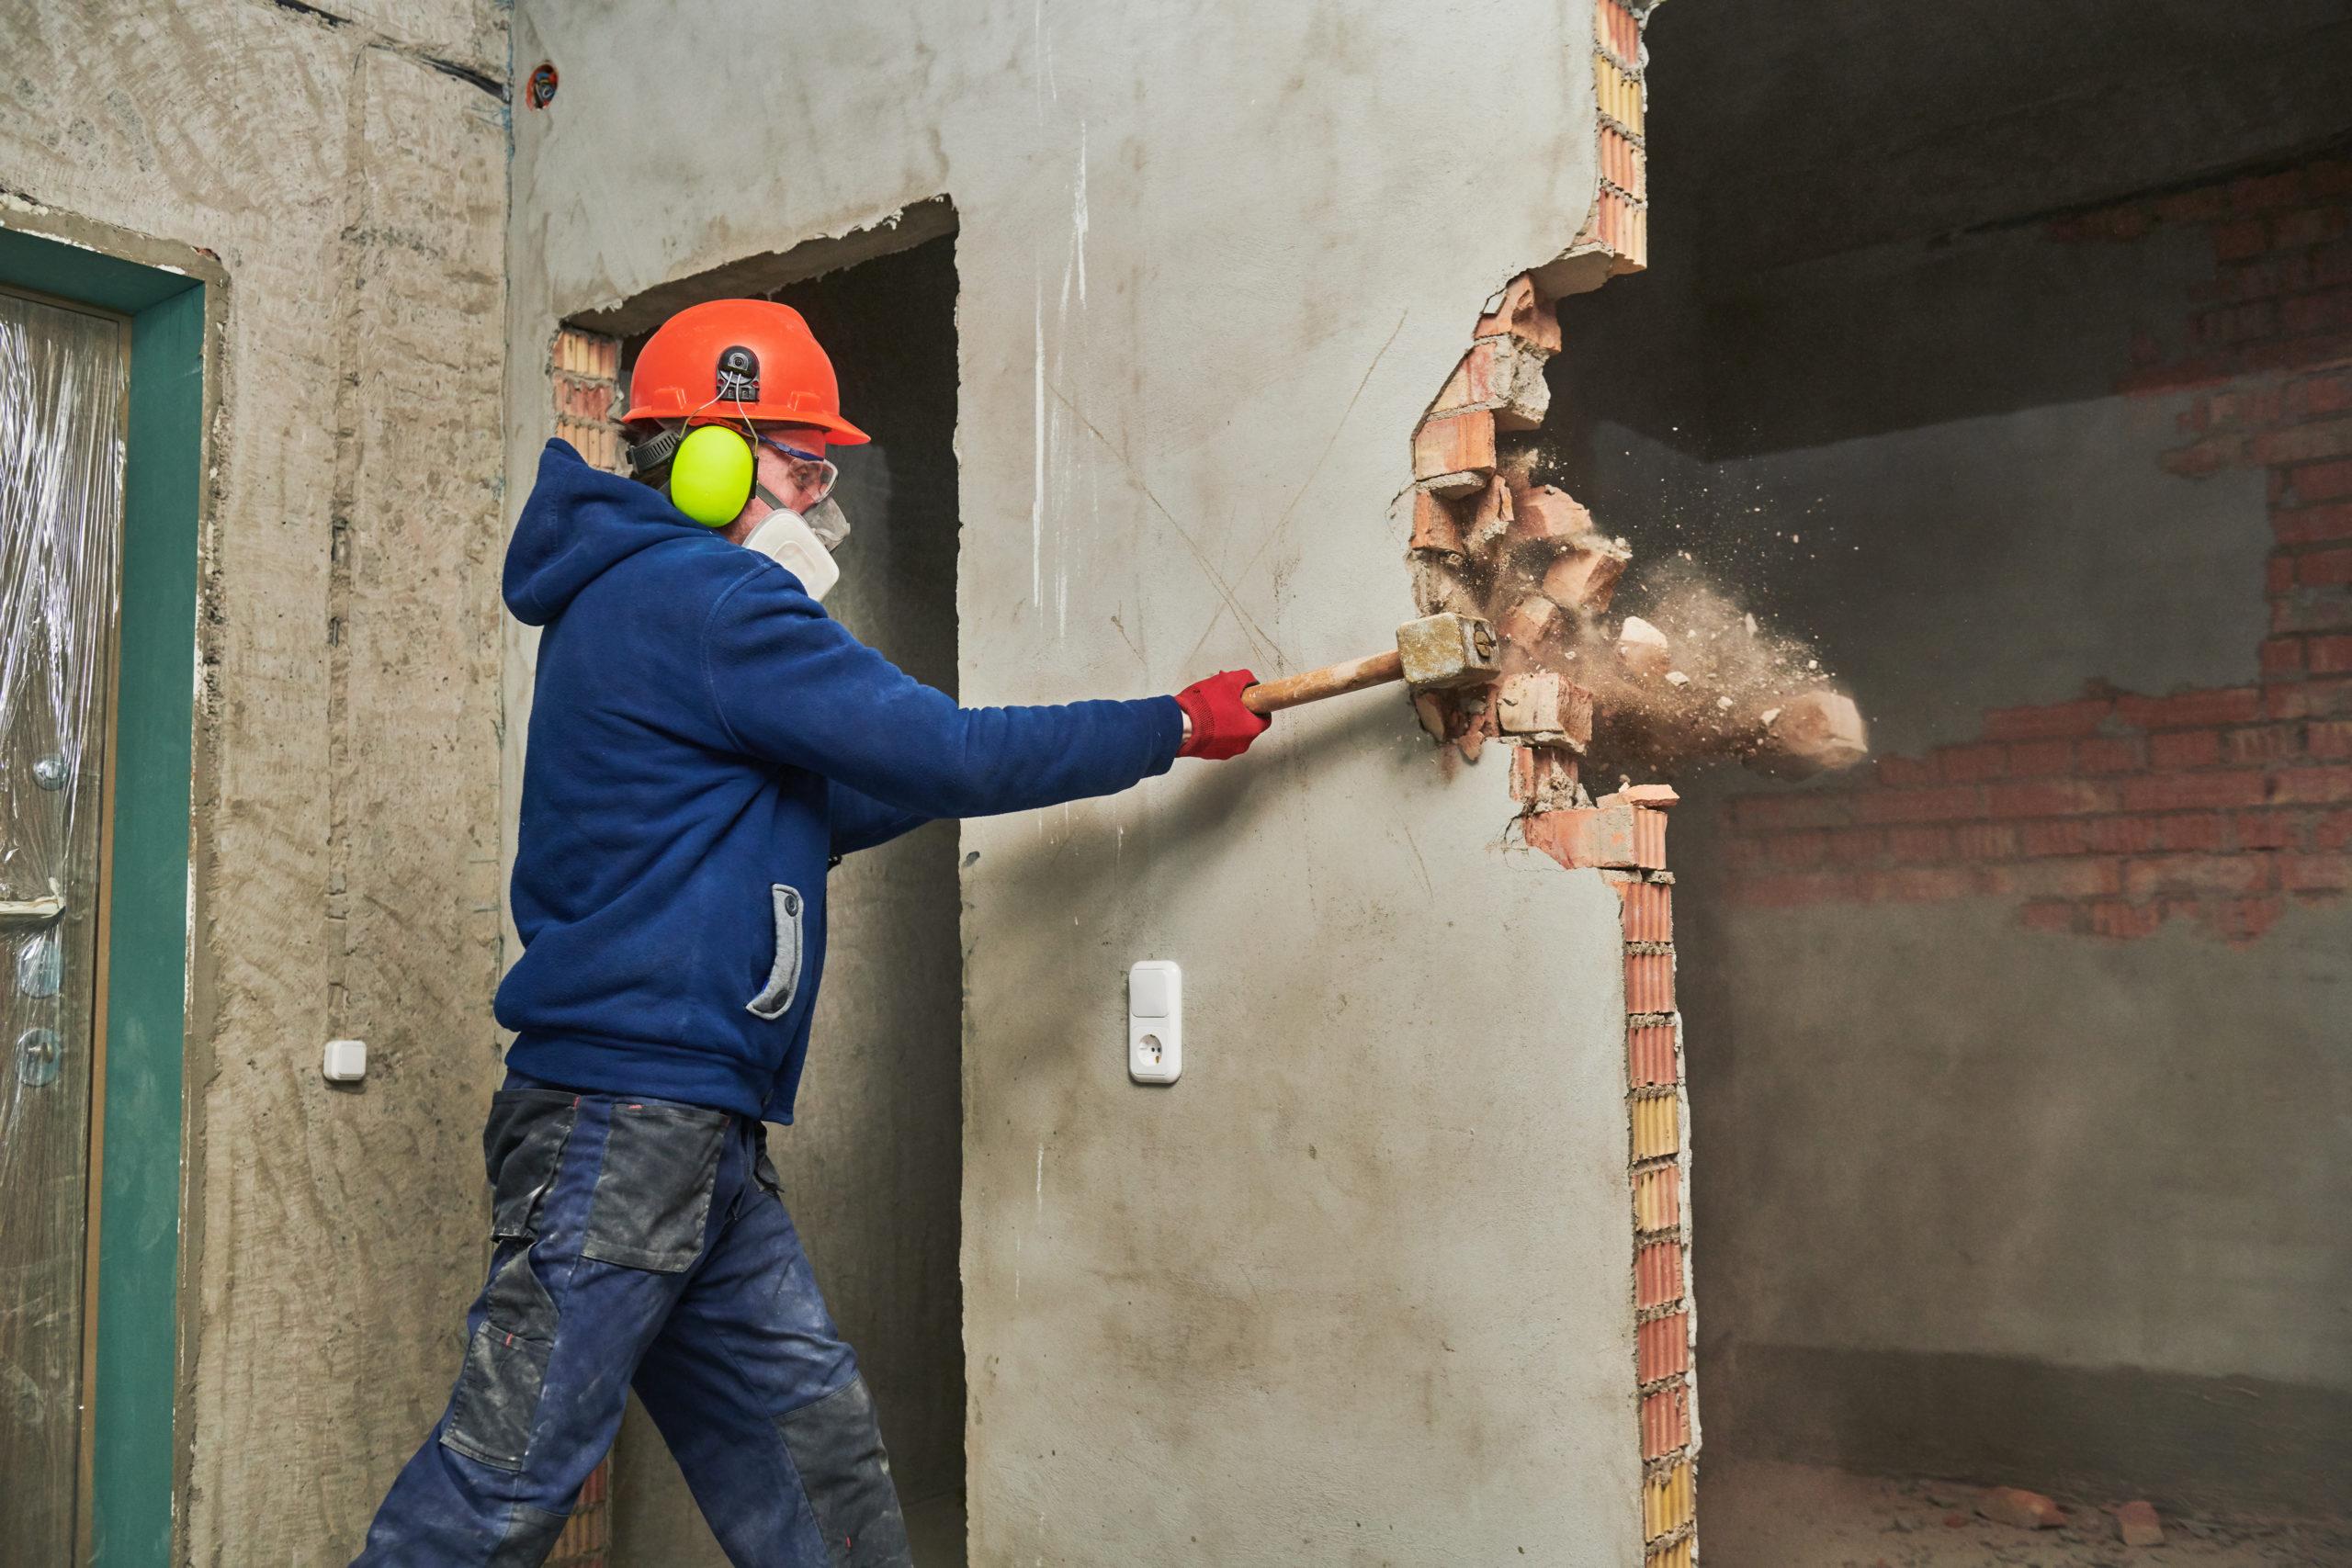 demolition work. Worker builder with sledgehammer destroying interior wall. Rearrangement during renovation. slow motion